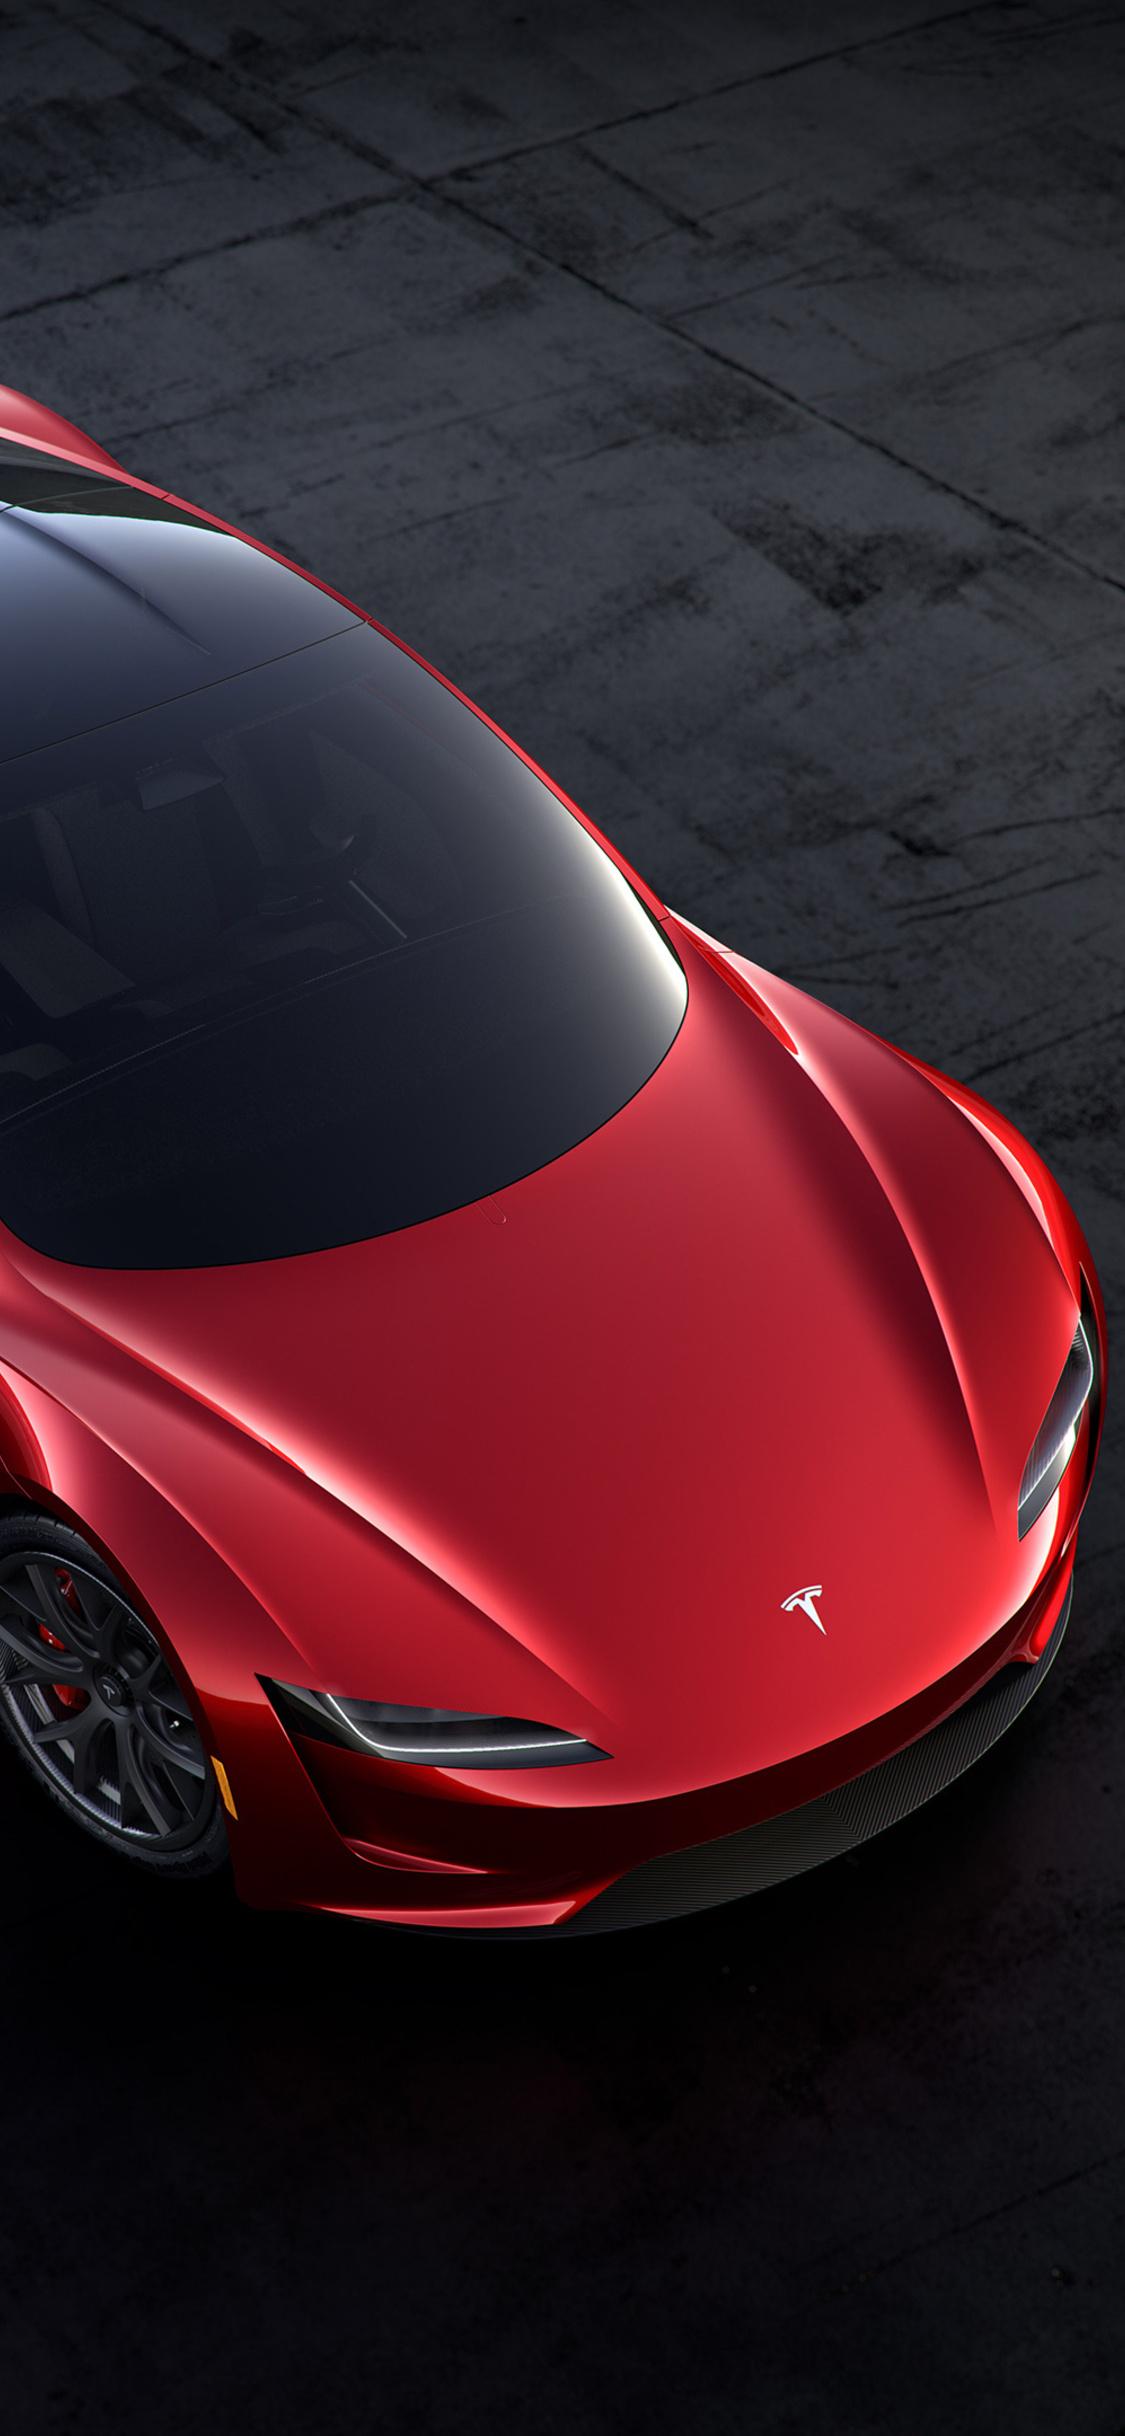 Supercars Gallery Tesla Roadster Iphone Wallpaper